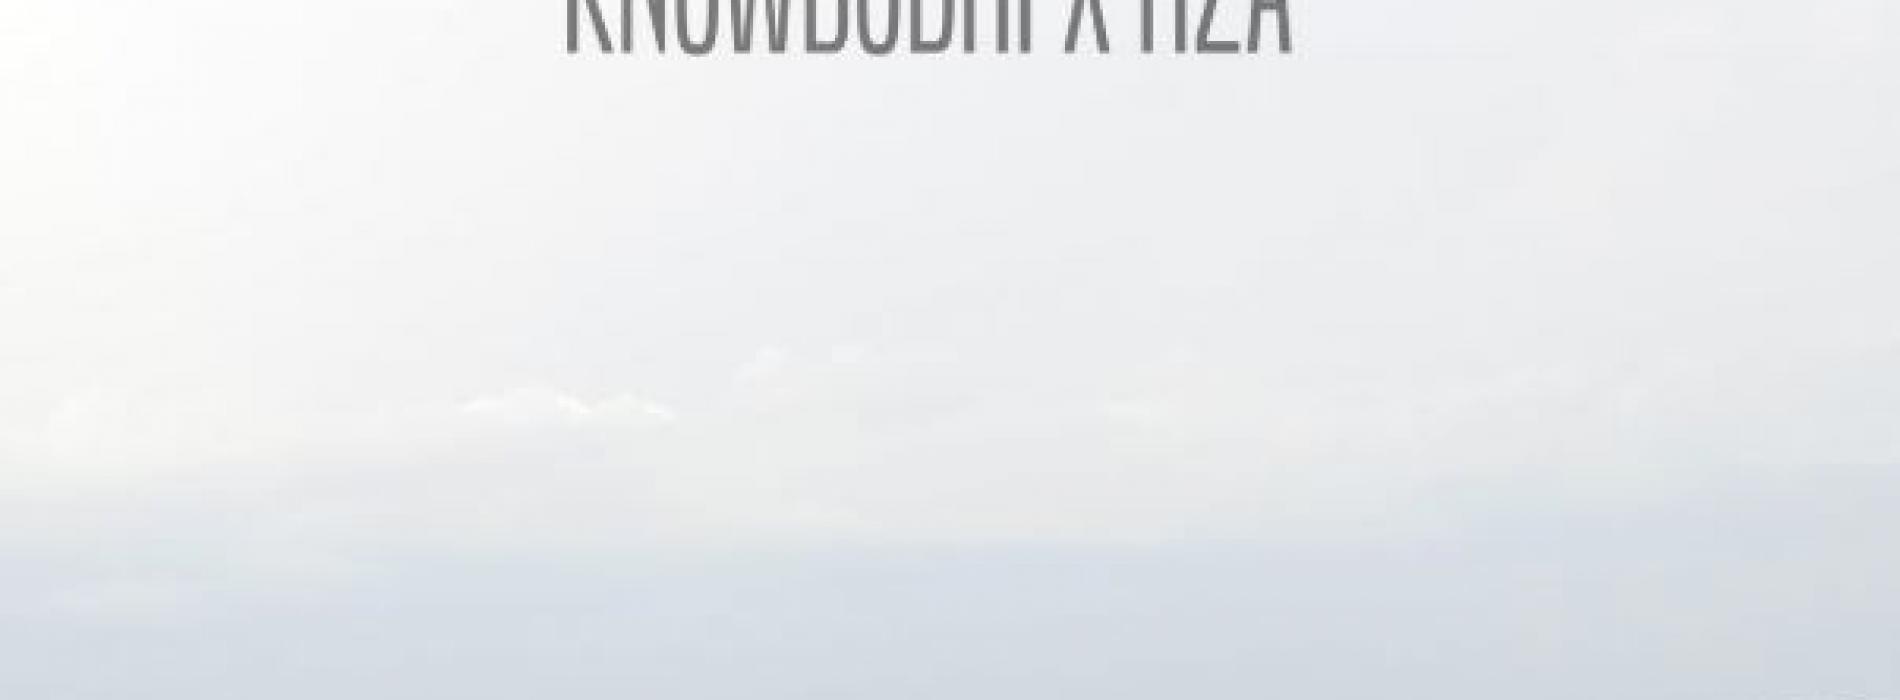 New Music : 2/3 (ft Tayvon, The Underground, Manasick, Logic)